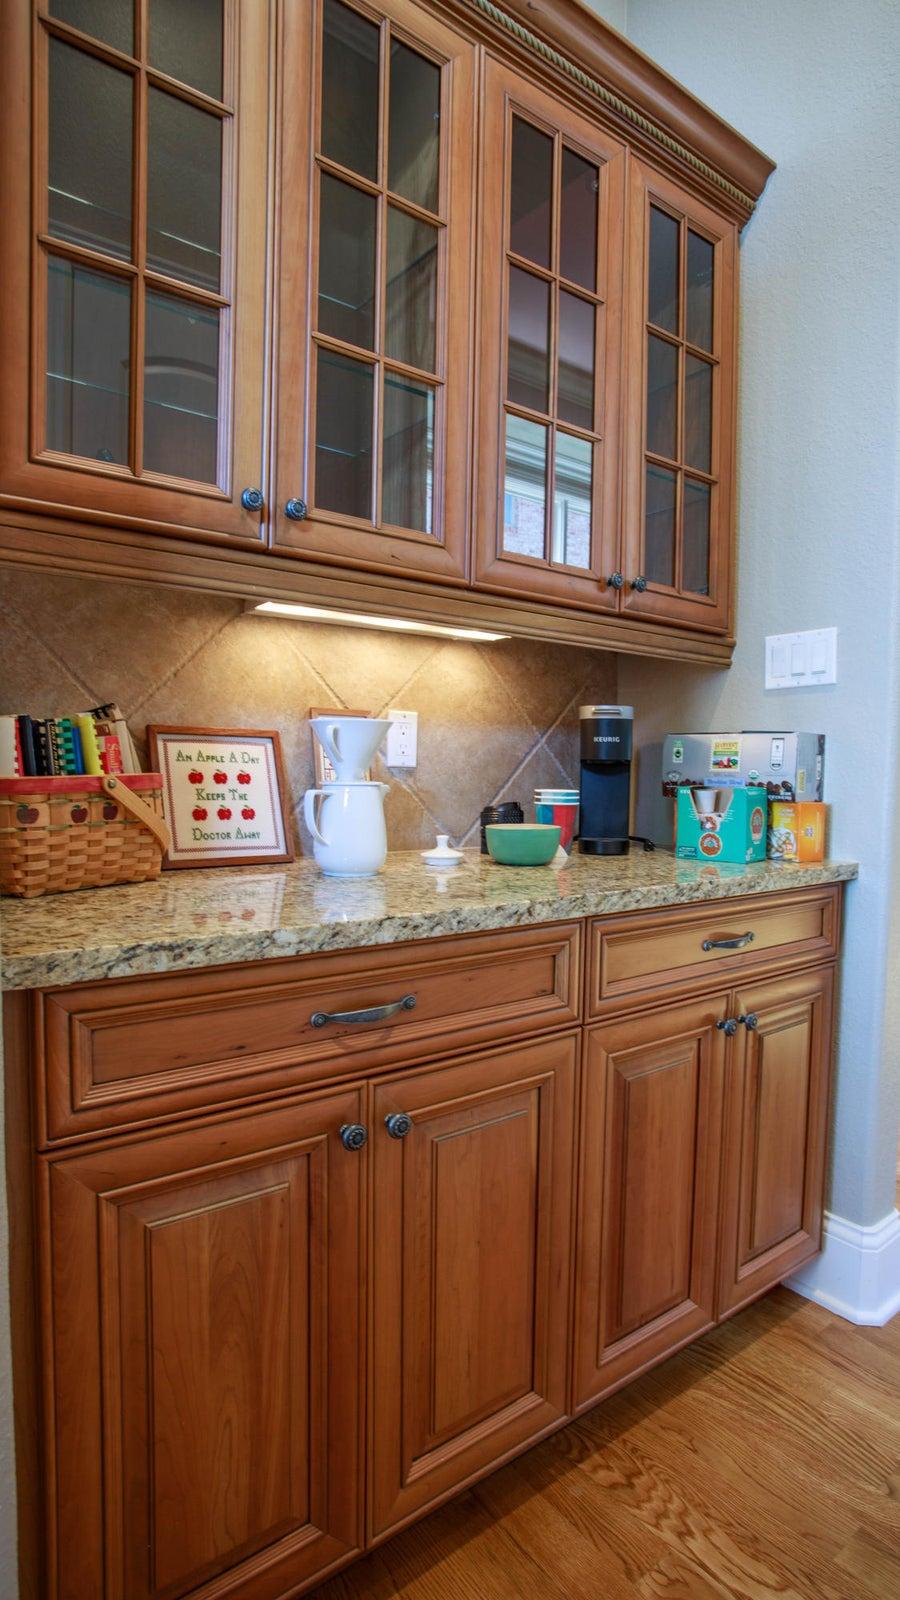 Butlers pantry - coffee/wine bar